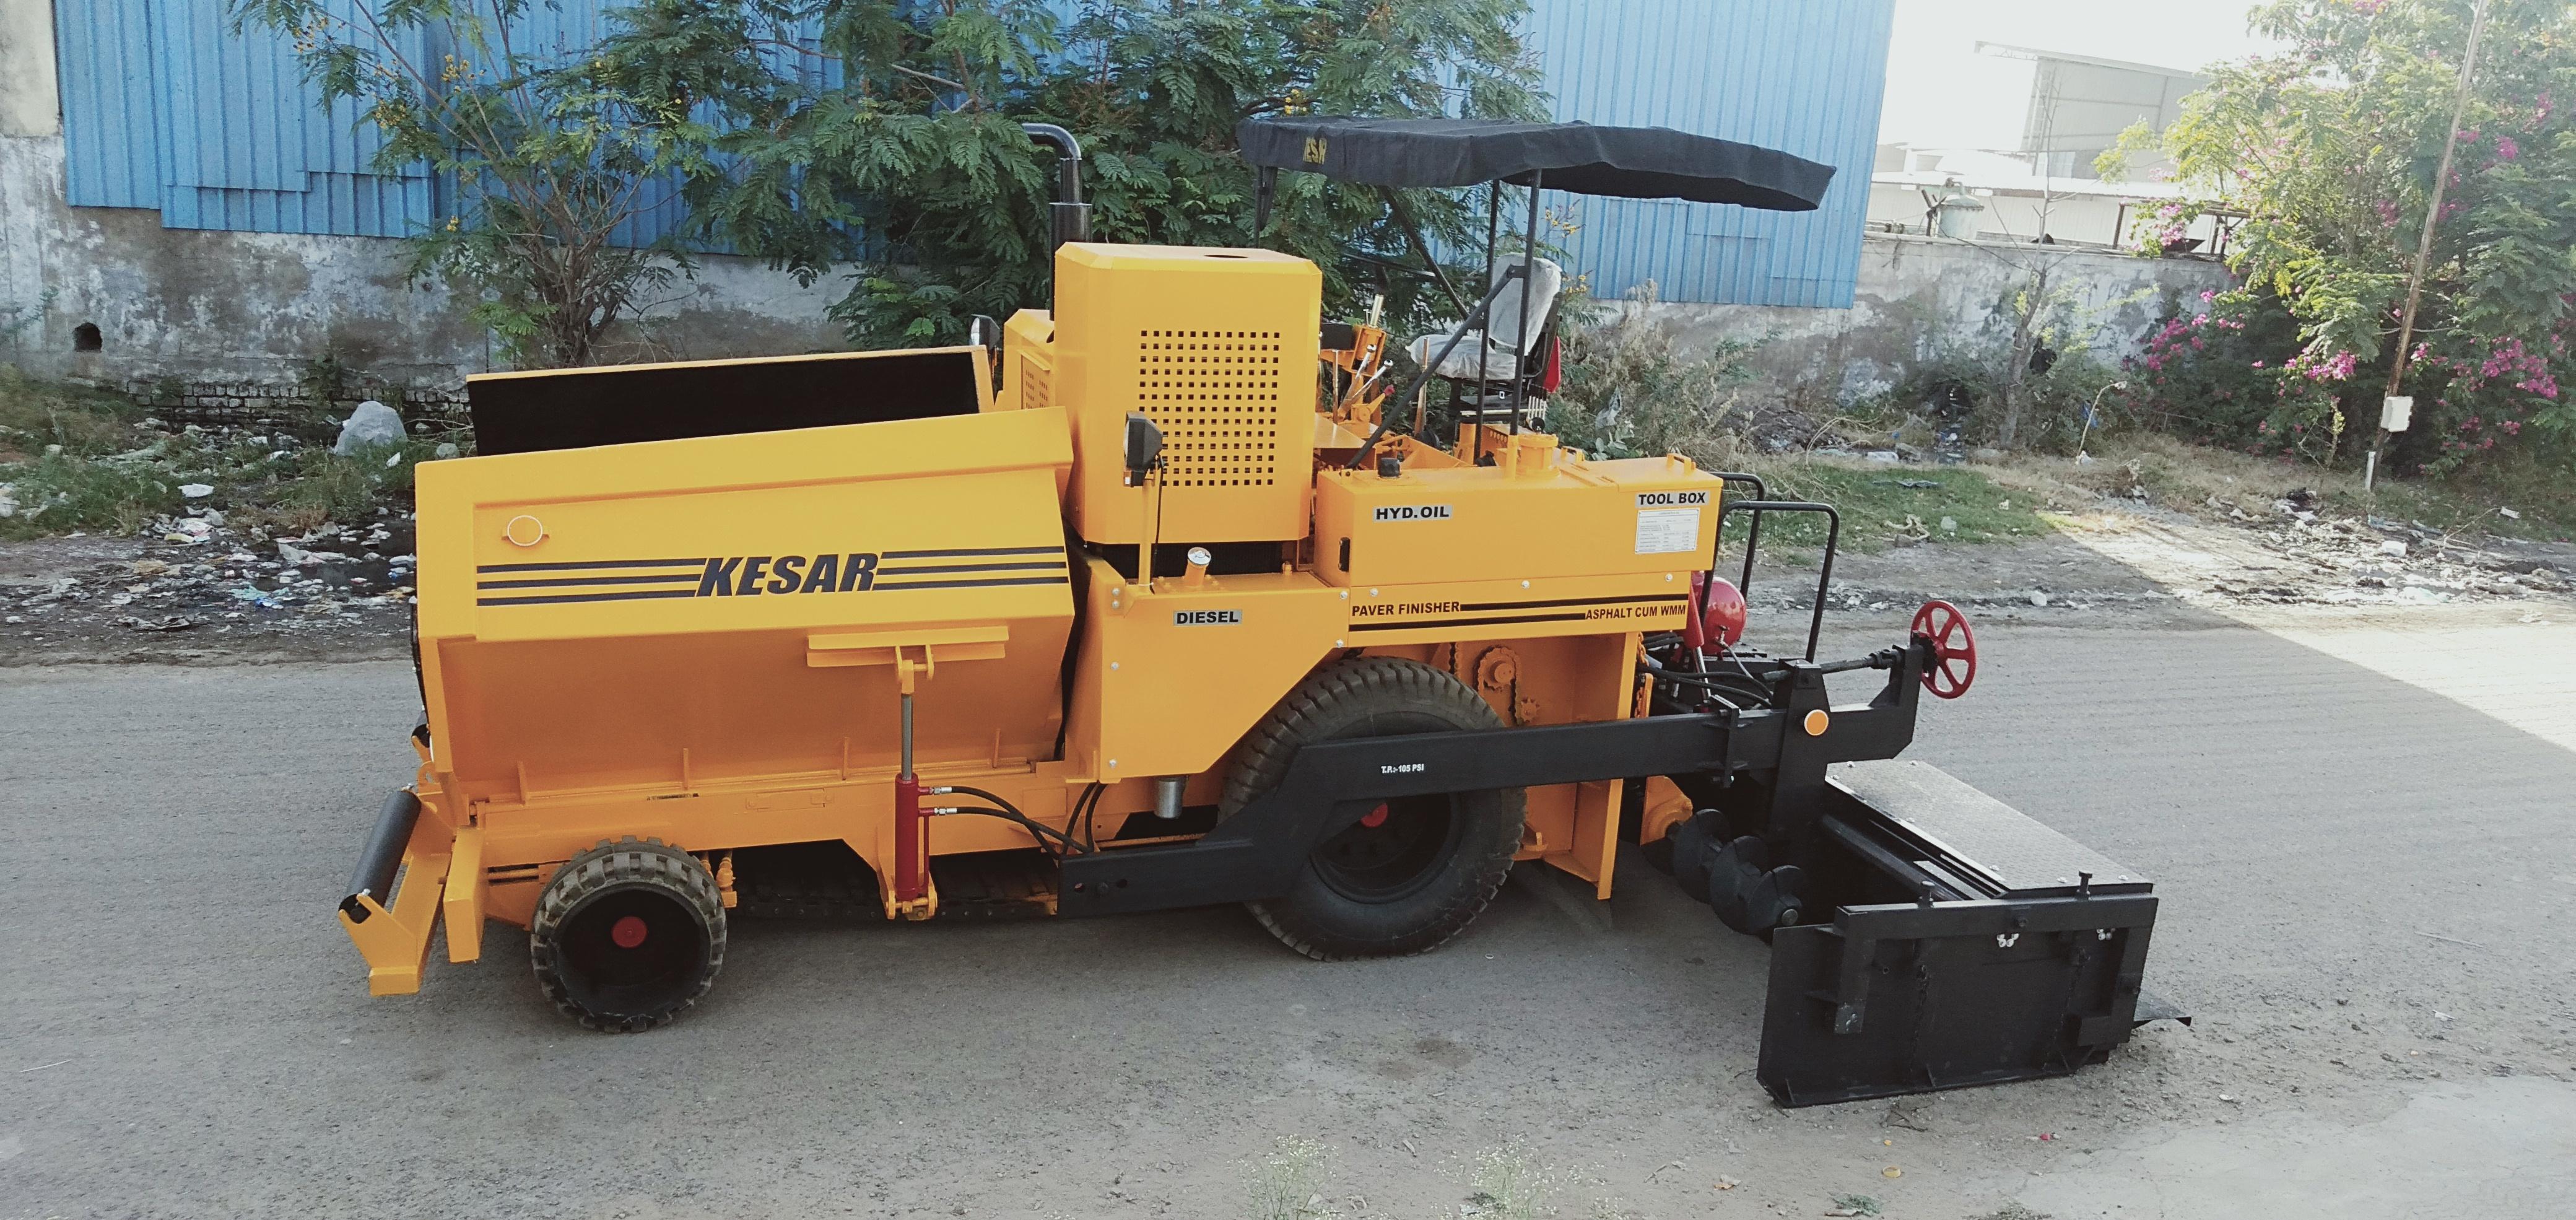 Road Paver Finisher Machine